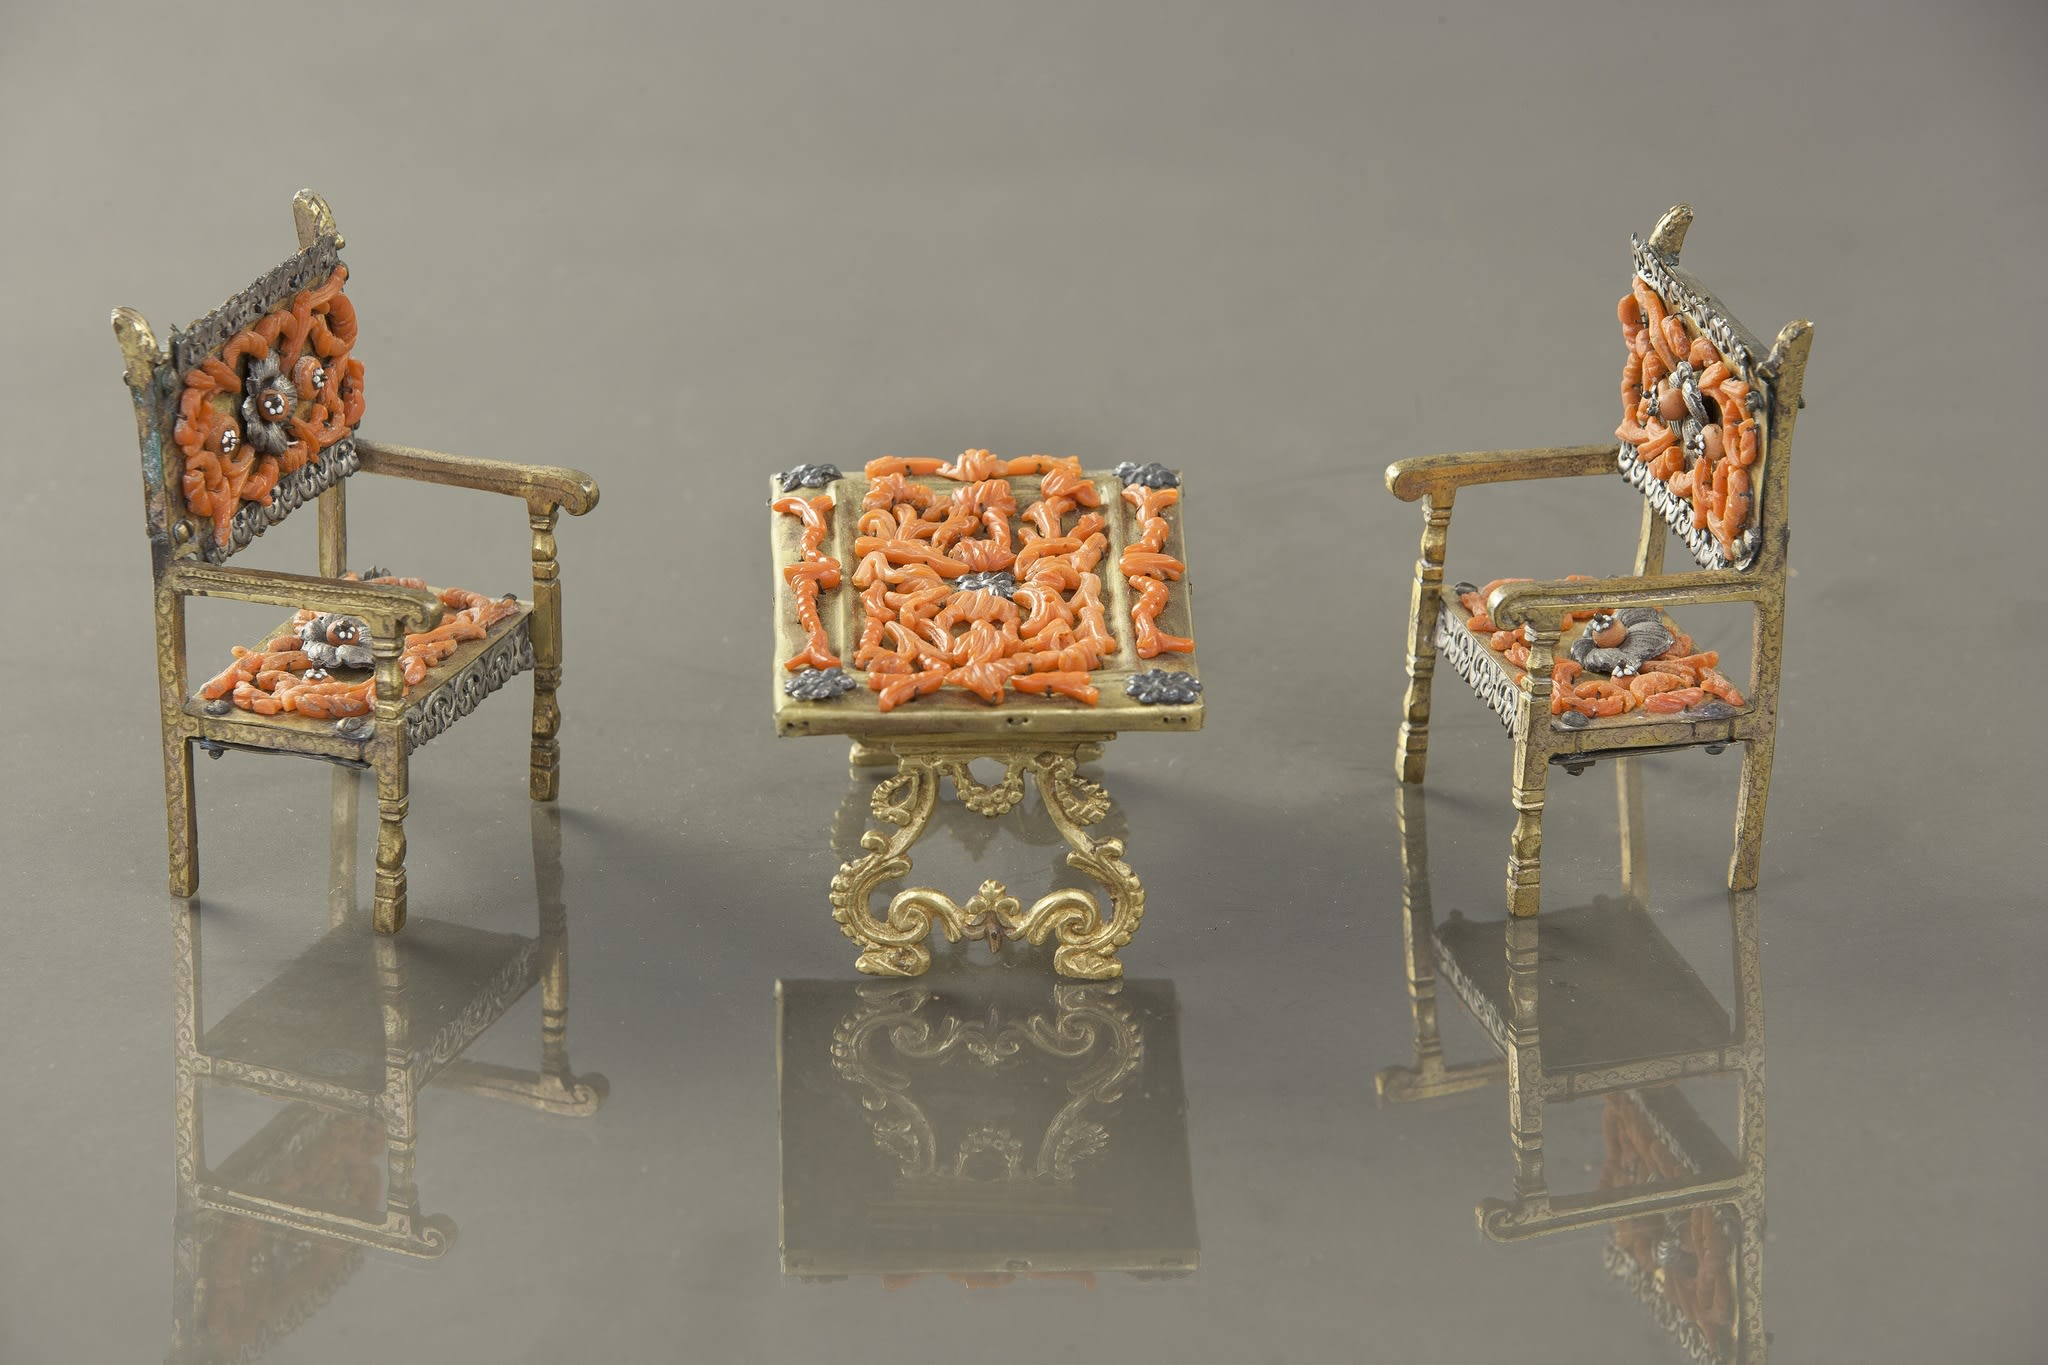 https://artlogic-res.cloudinary.com/w_2400,h_2400,c_limit,f_auto,fl_lossy,q_auto/artlogicstorage/brunfineart/images/view/8f038acd0d5523a45fa91b7df31fffb7de1eb29c/brunfineart-trapani-miniature-furniture-17th-18th-century.jpg